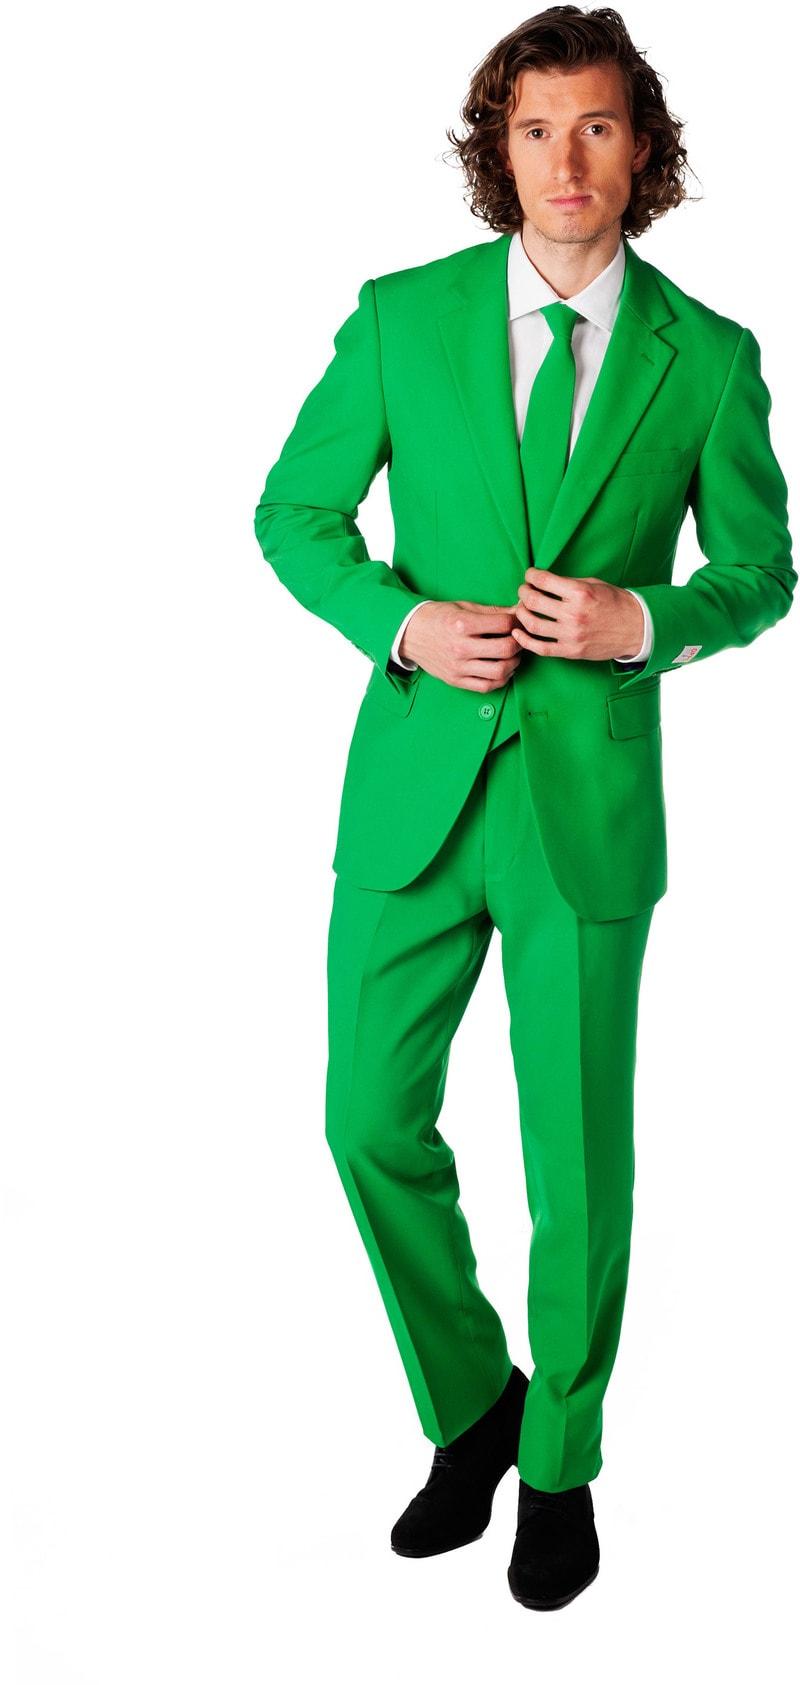 7b12ce1b194 OppoSuits Evergreen Kostuum   Groen pak OSUI-0028 Evergreen